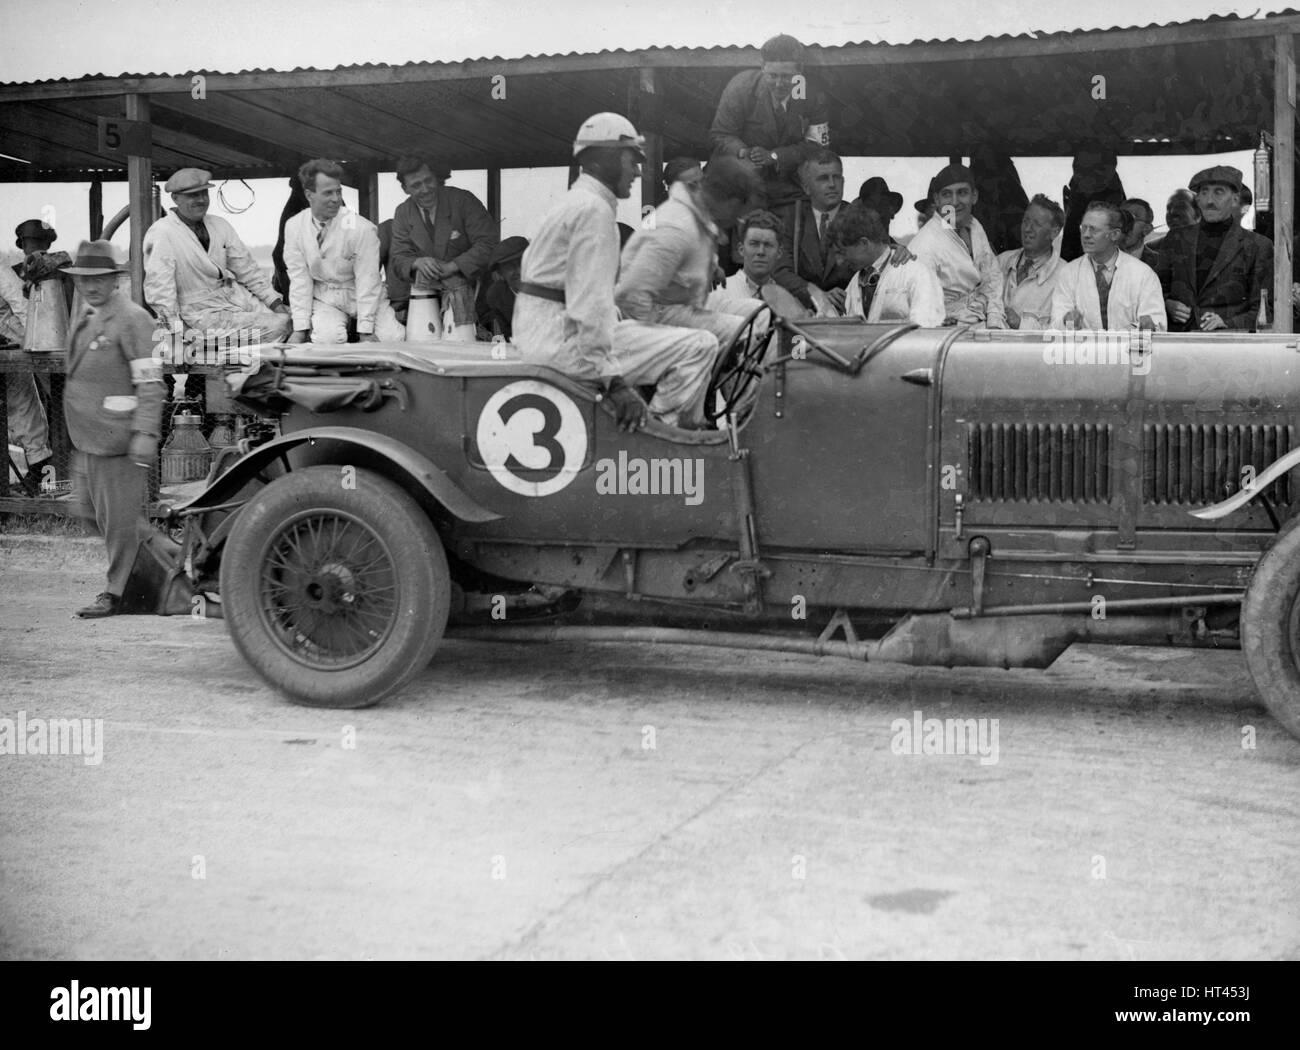 Winning Bentley of Jack Dunfee and Woolf Barnato, BARC 6-Hour Race, Brooklands, Surrey, 1929, Artist: Bill Brunell. - Stock Image